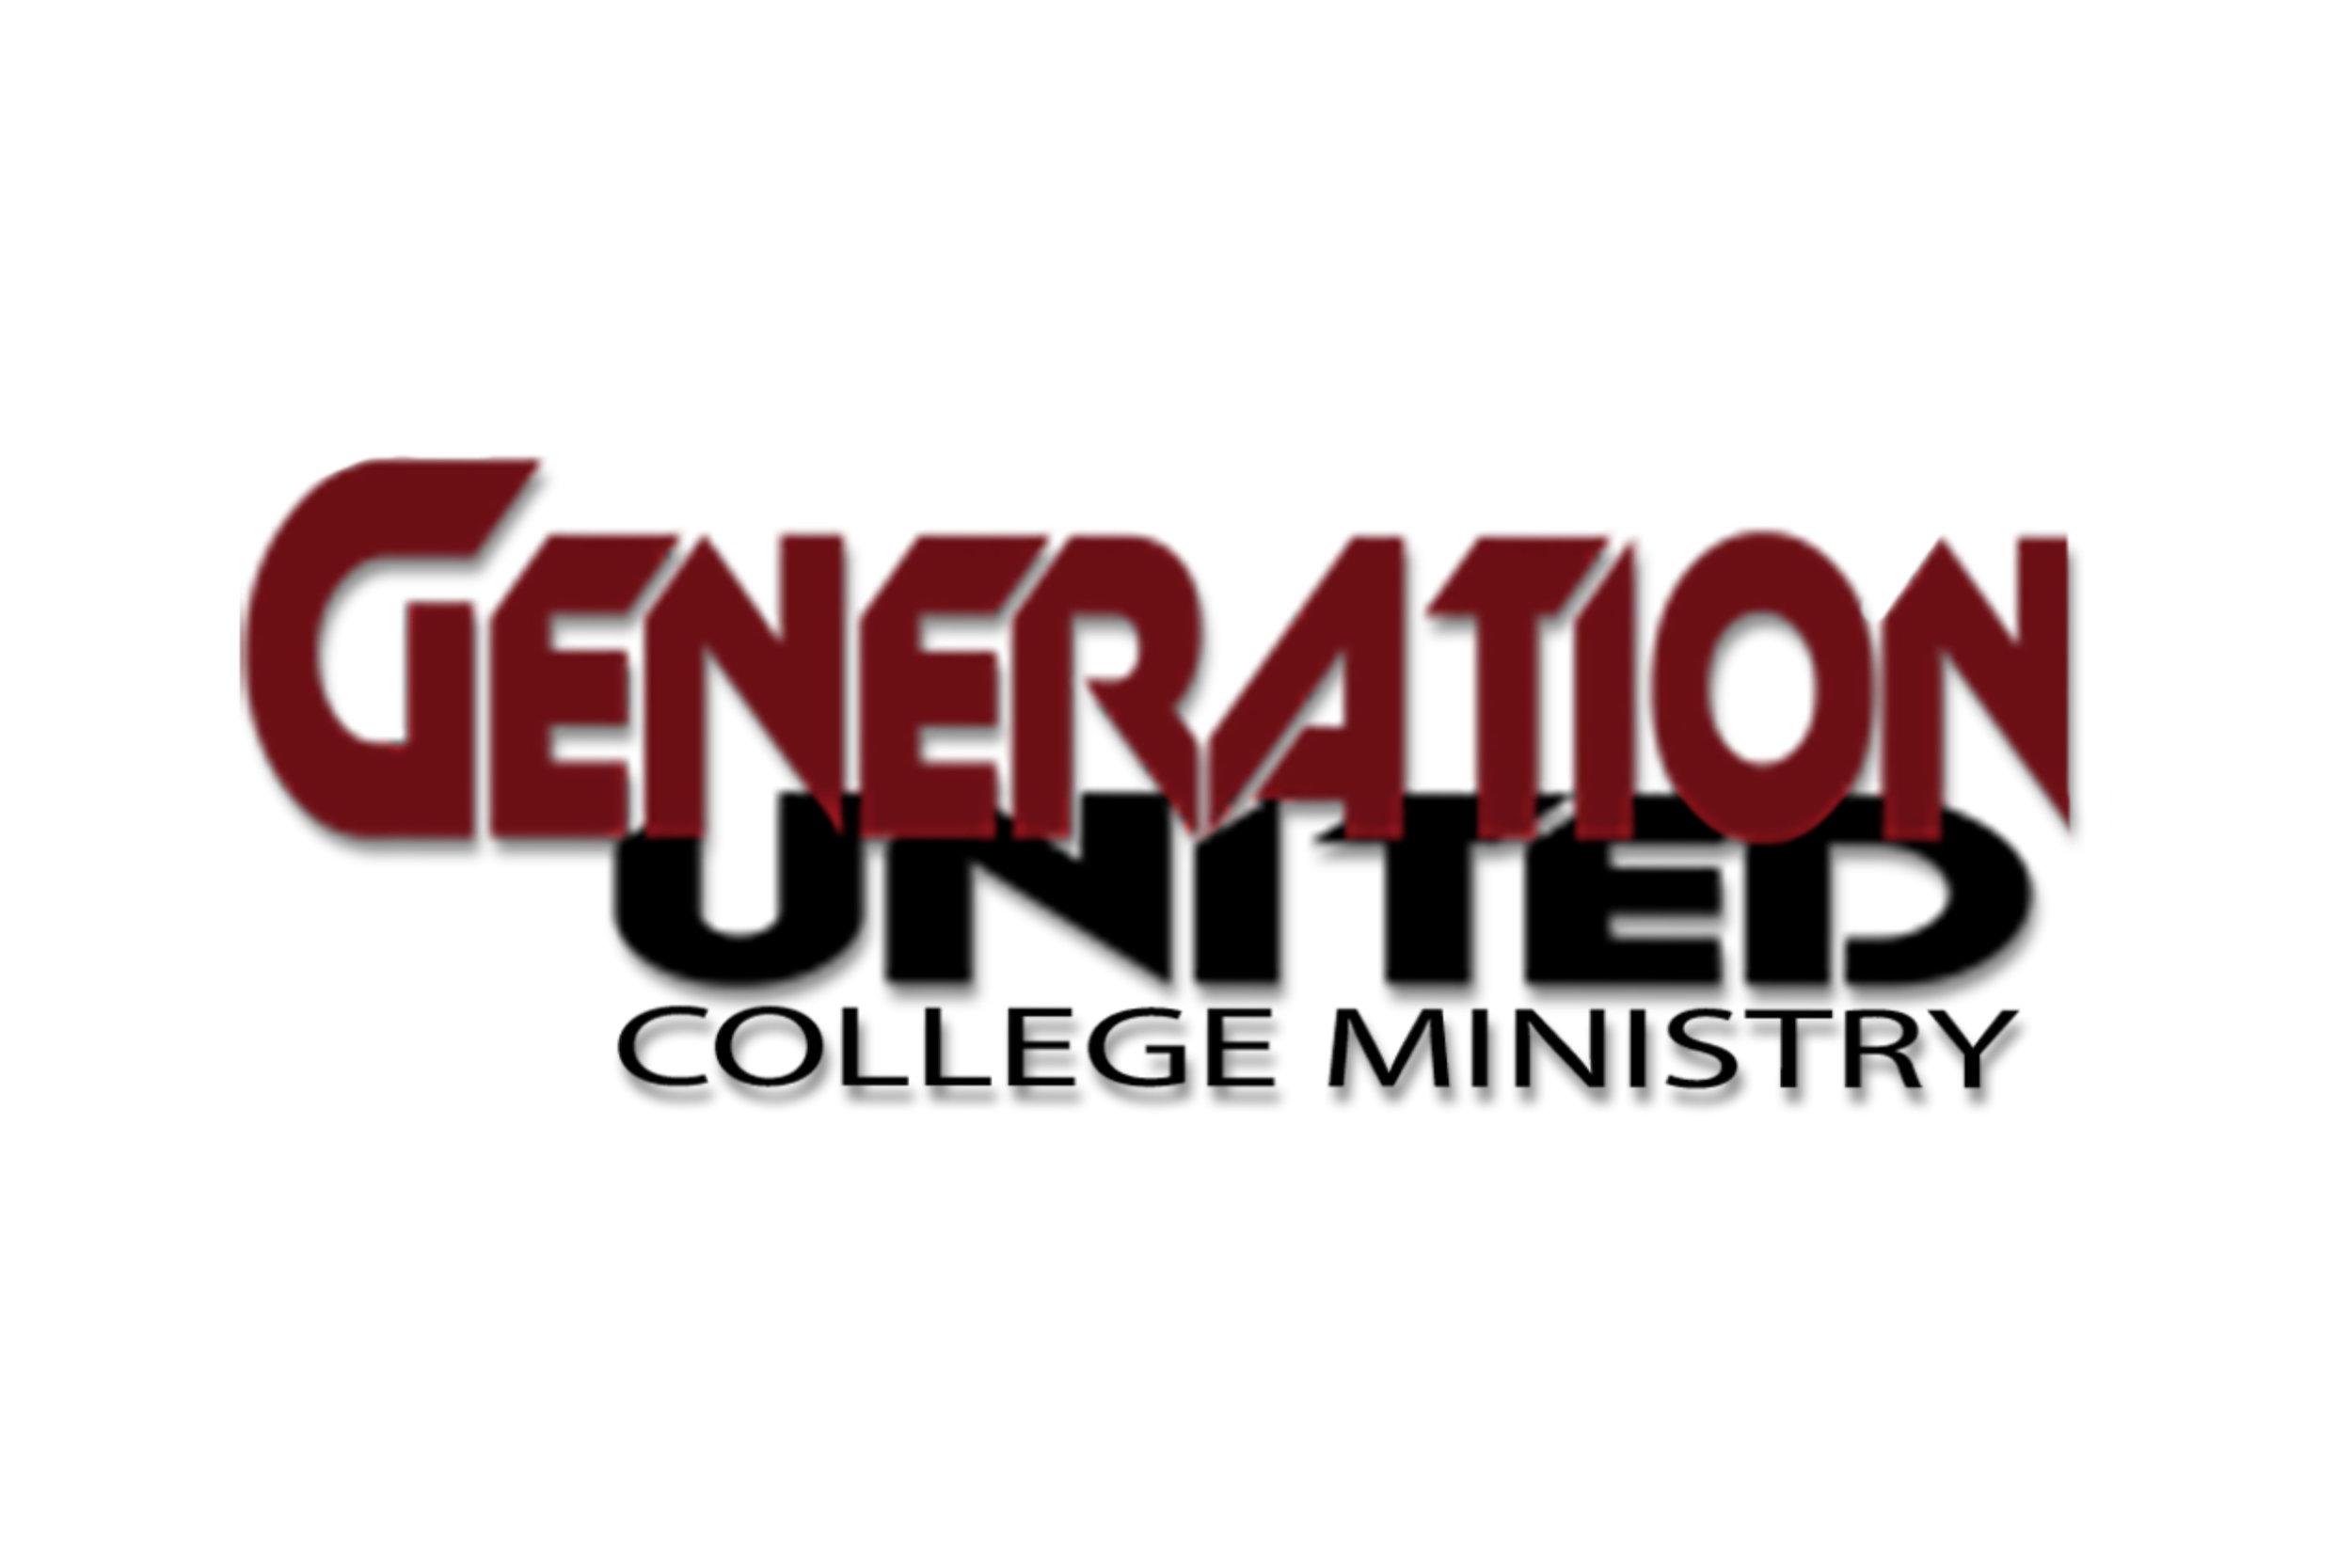 saint mark college ministry